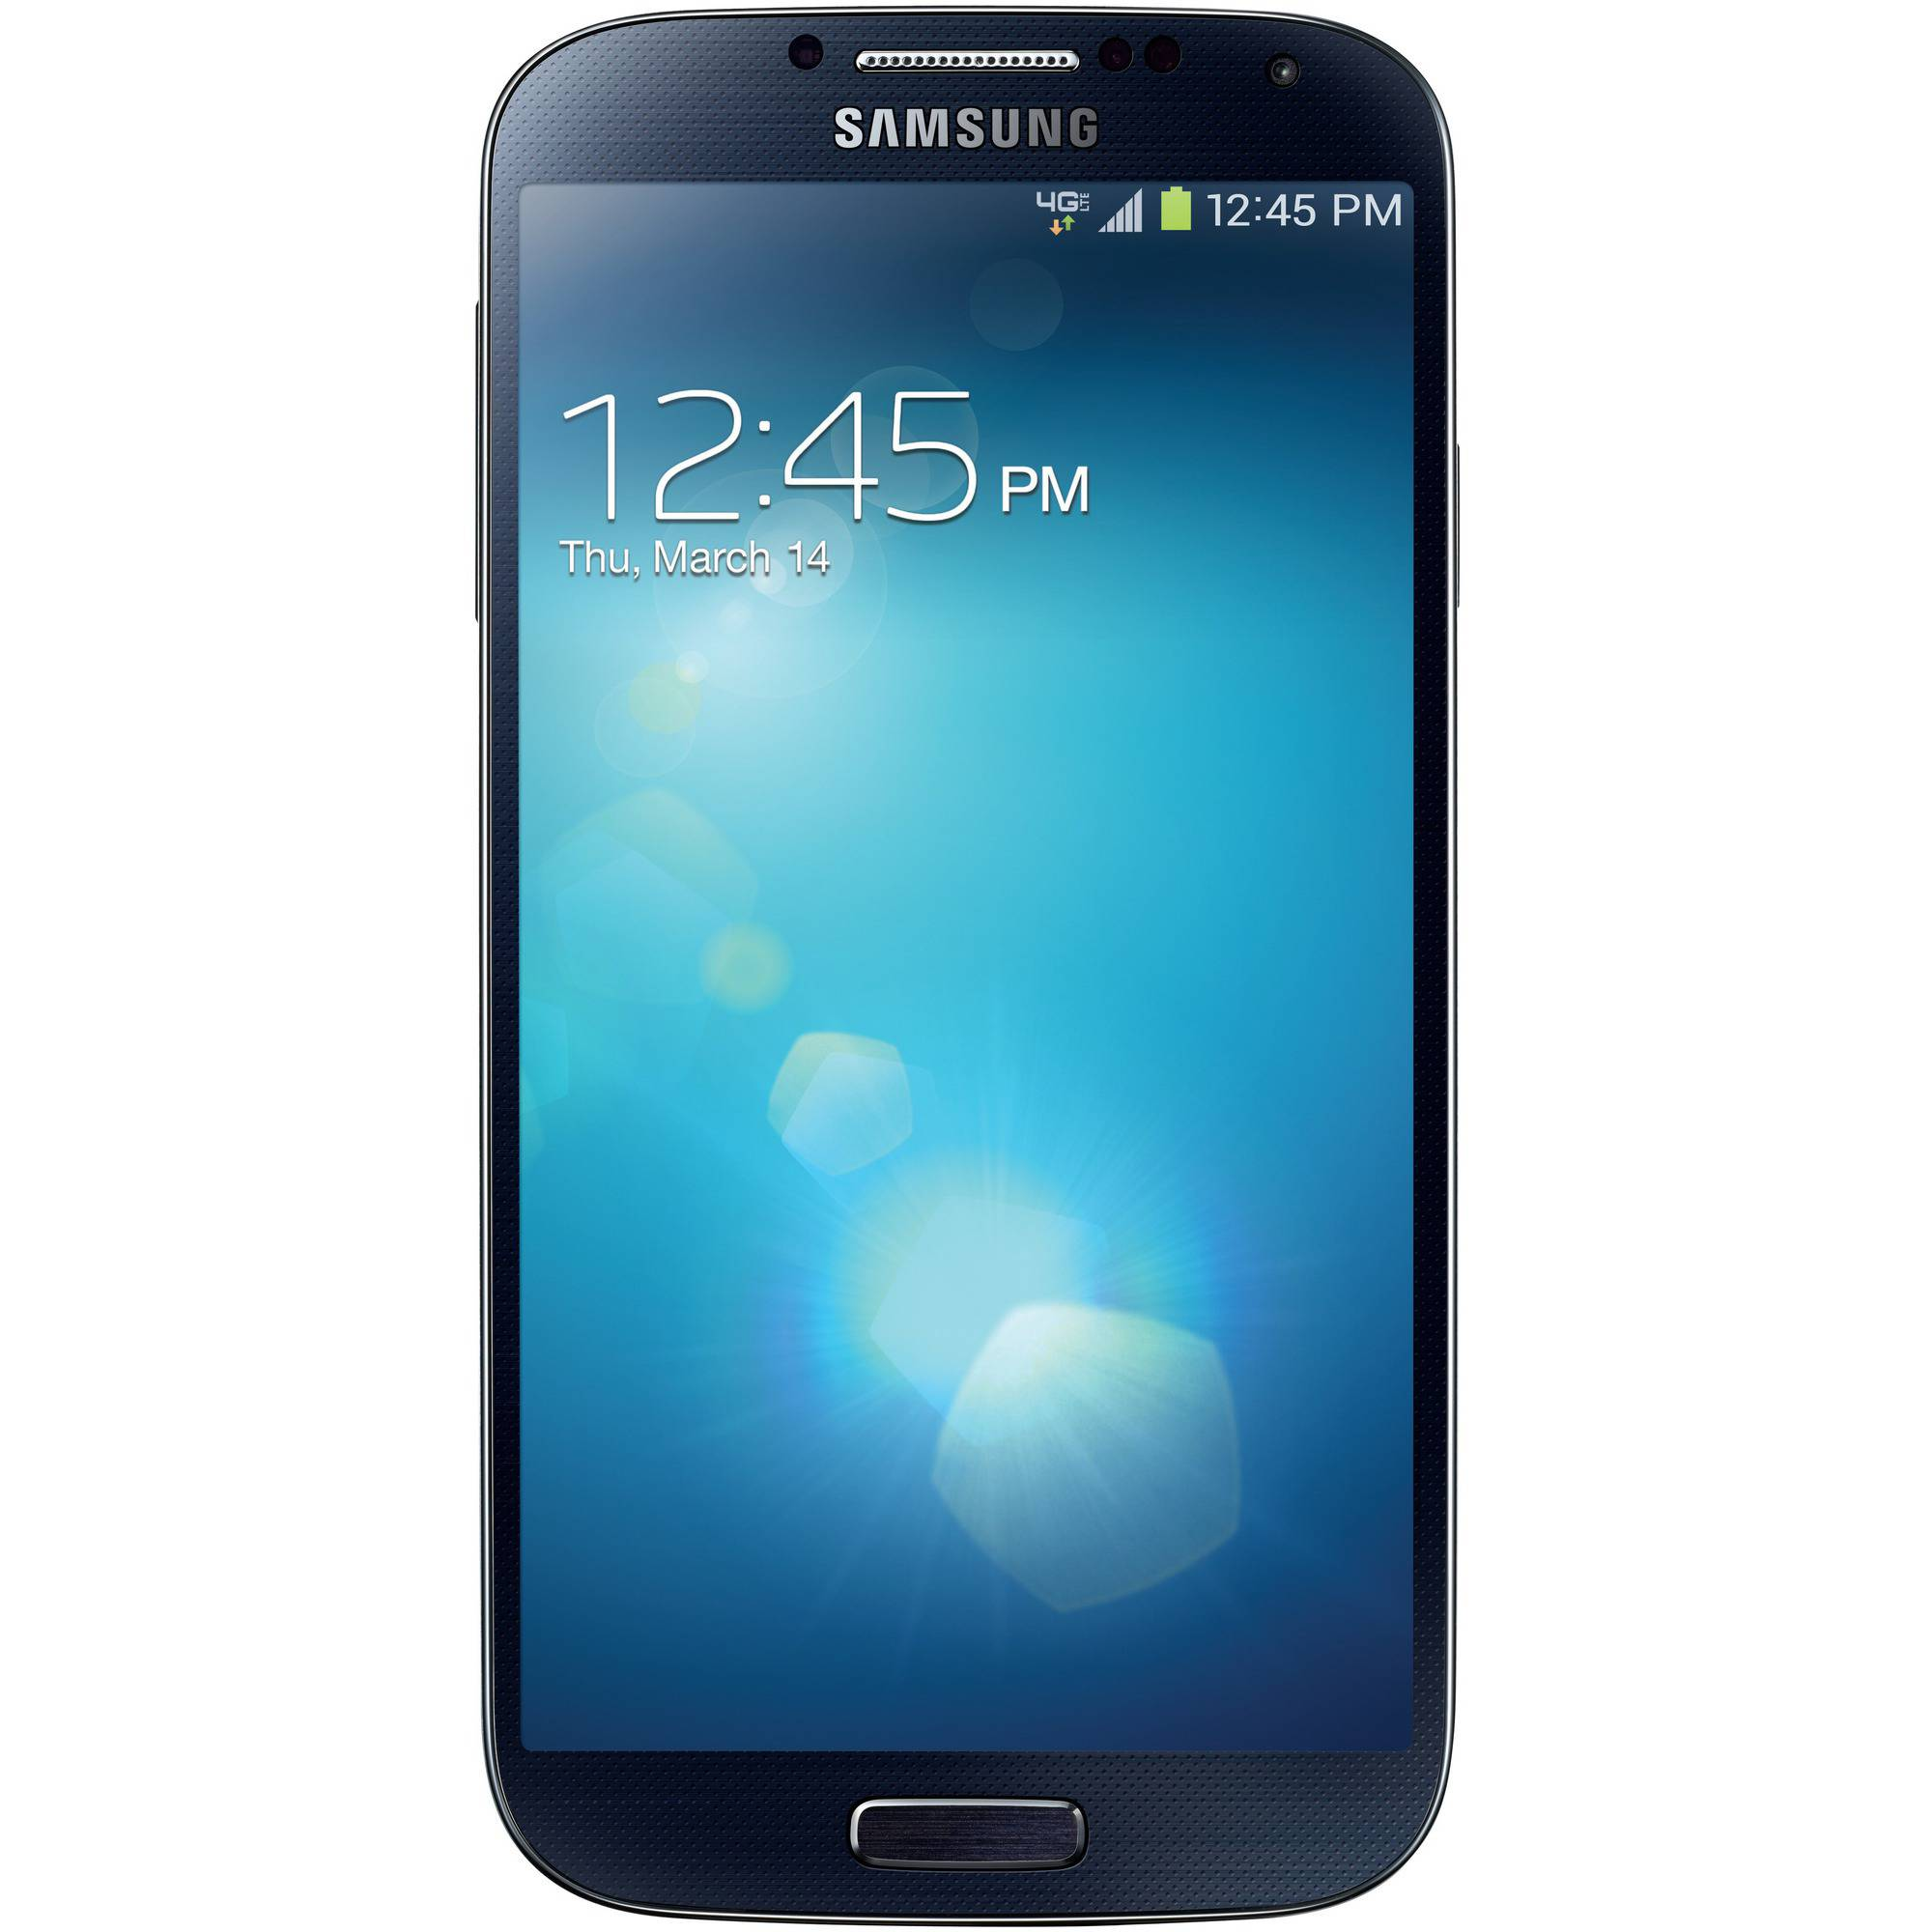 verizon samsung smartphones. samsung galaxy s4 certified pre-owned smartphone, (verizon) - walmart.com verizon smartphones